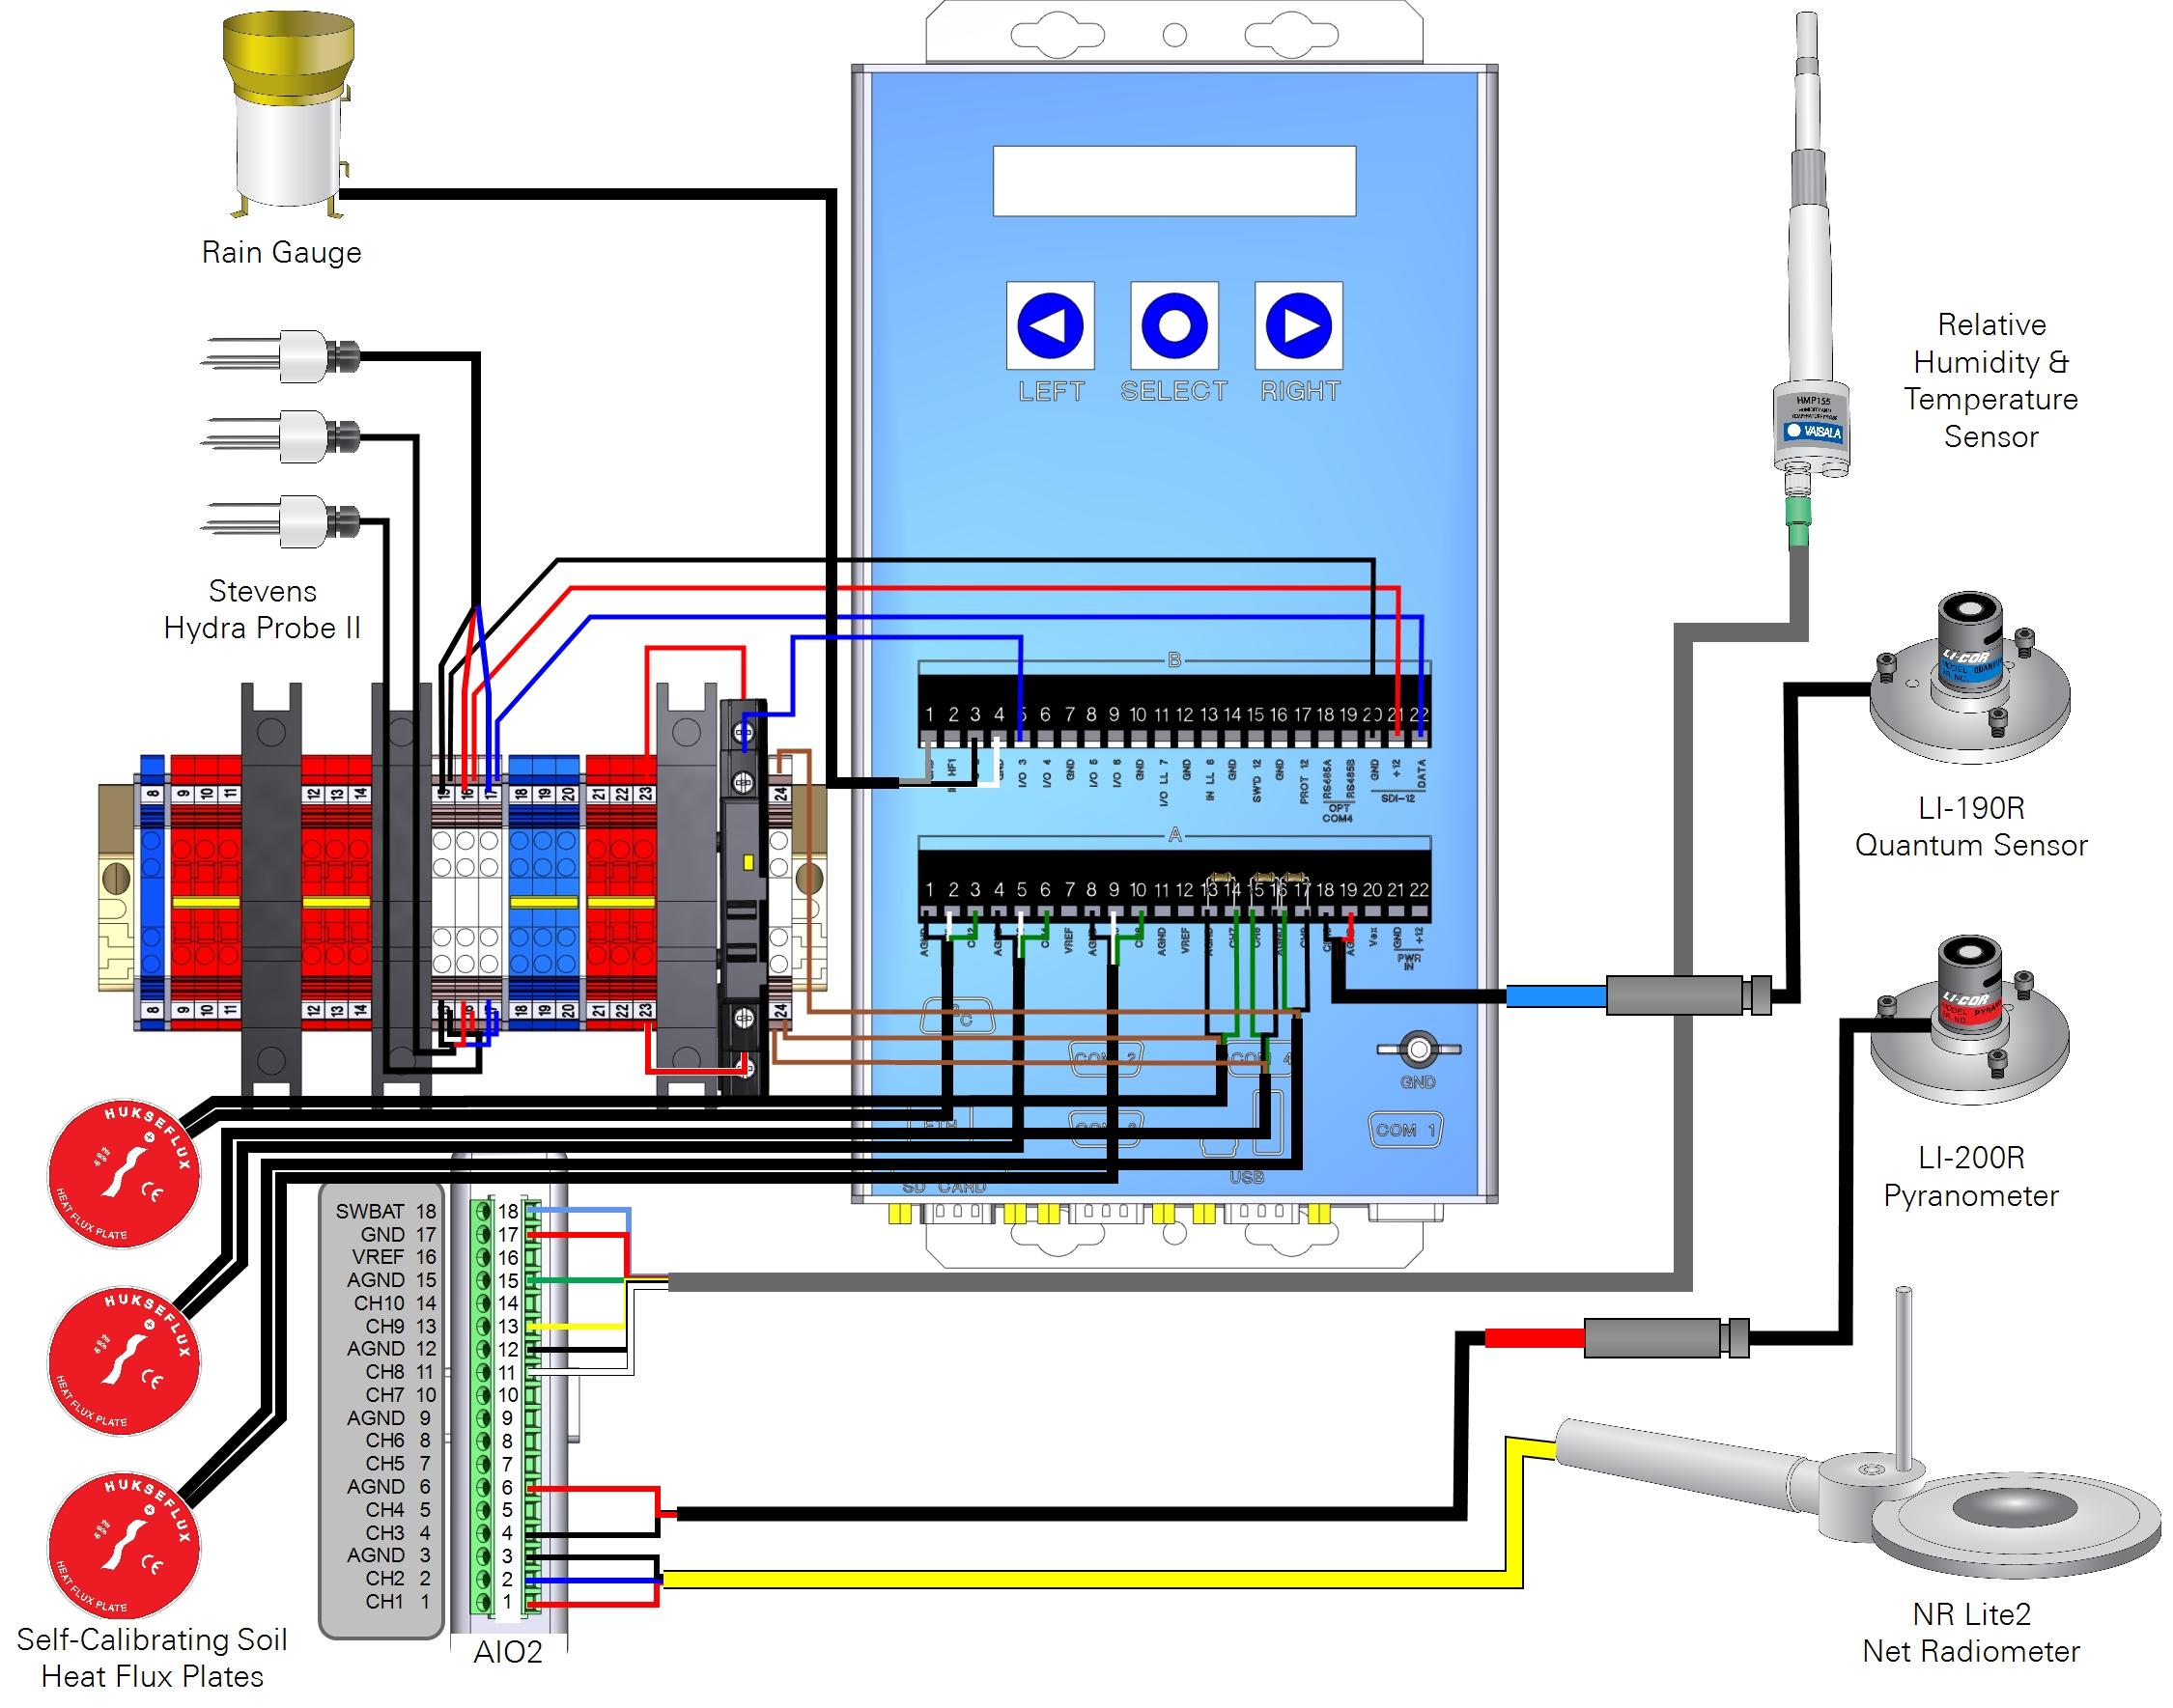 Fabulous Biomet System Using Biomet Programs Wiring Cloud Hisonuggs Outletorg